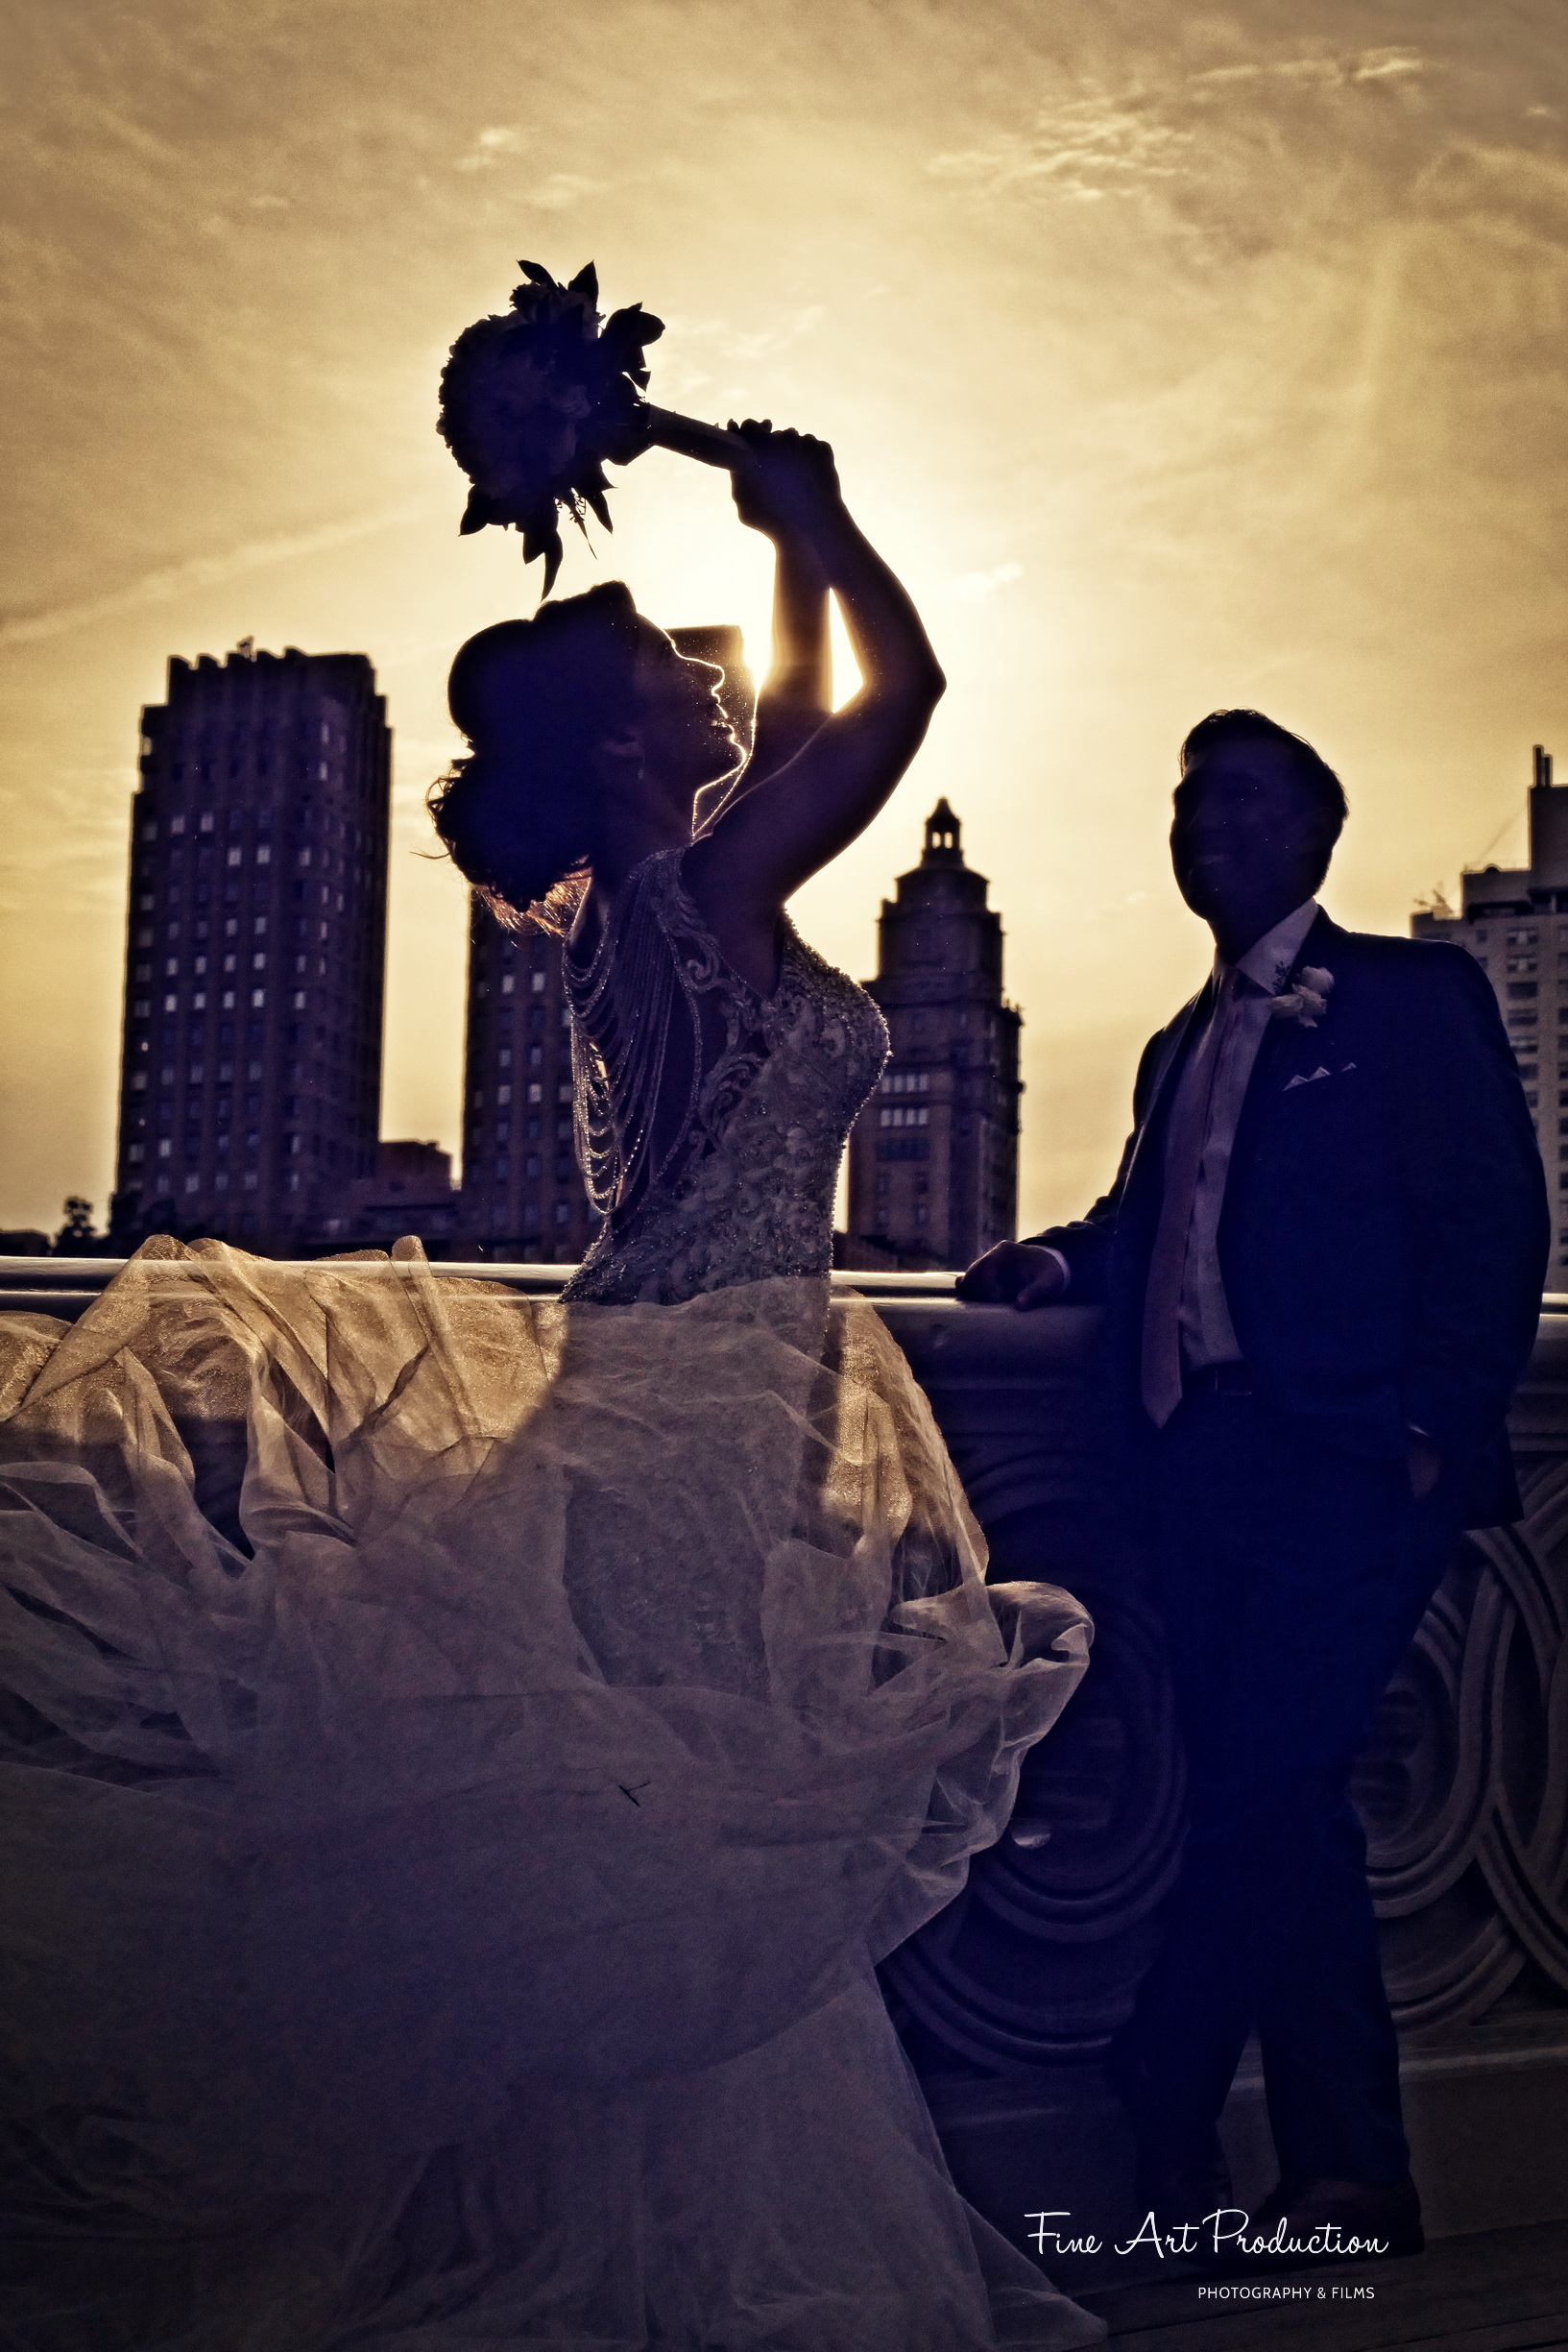 india-wedding-photographer-fine-art-production-chirali-amish-thakkar_0111